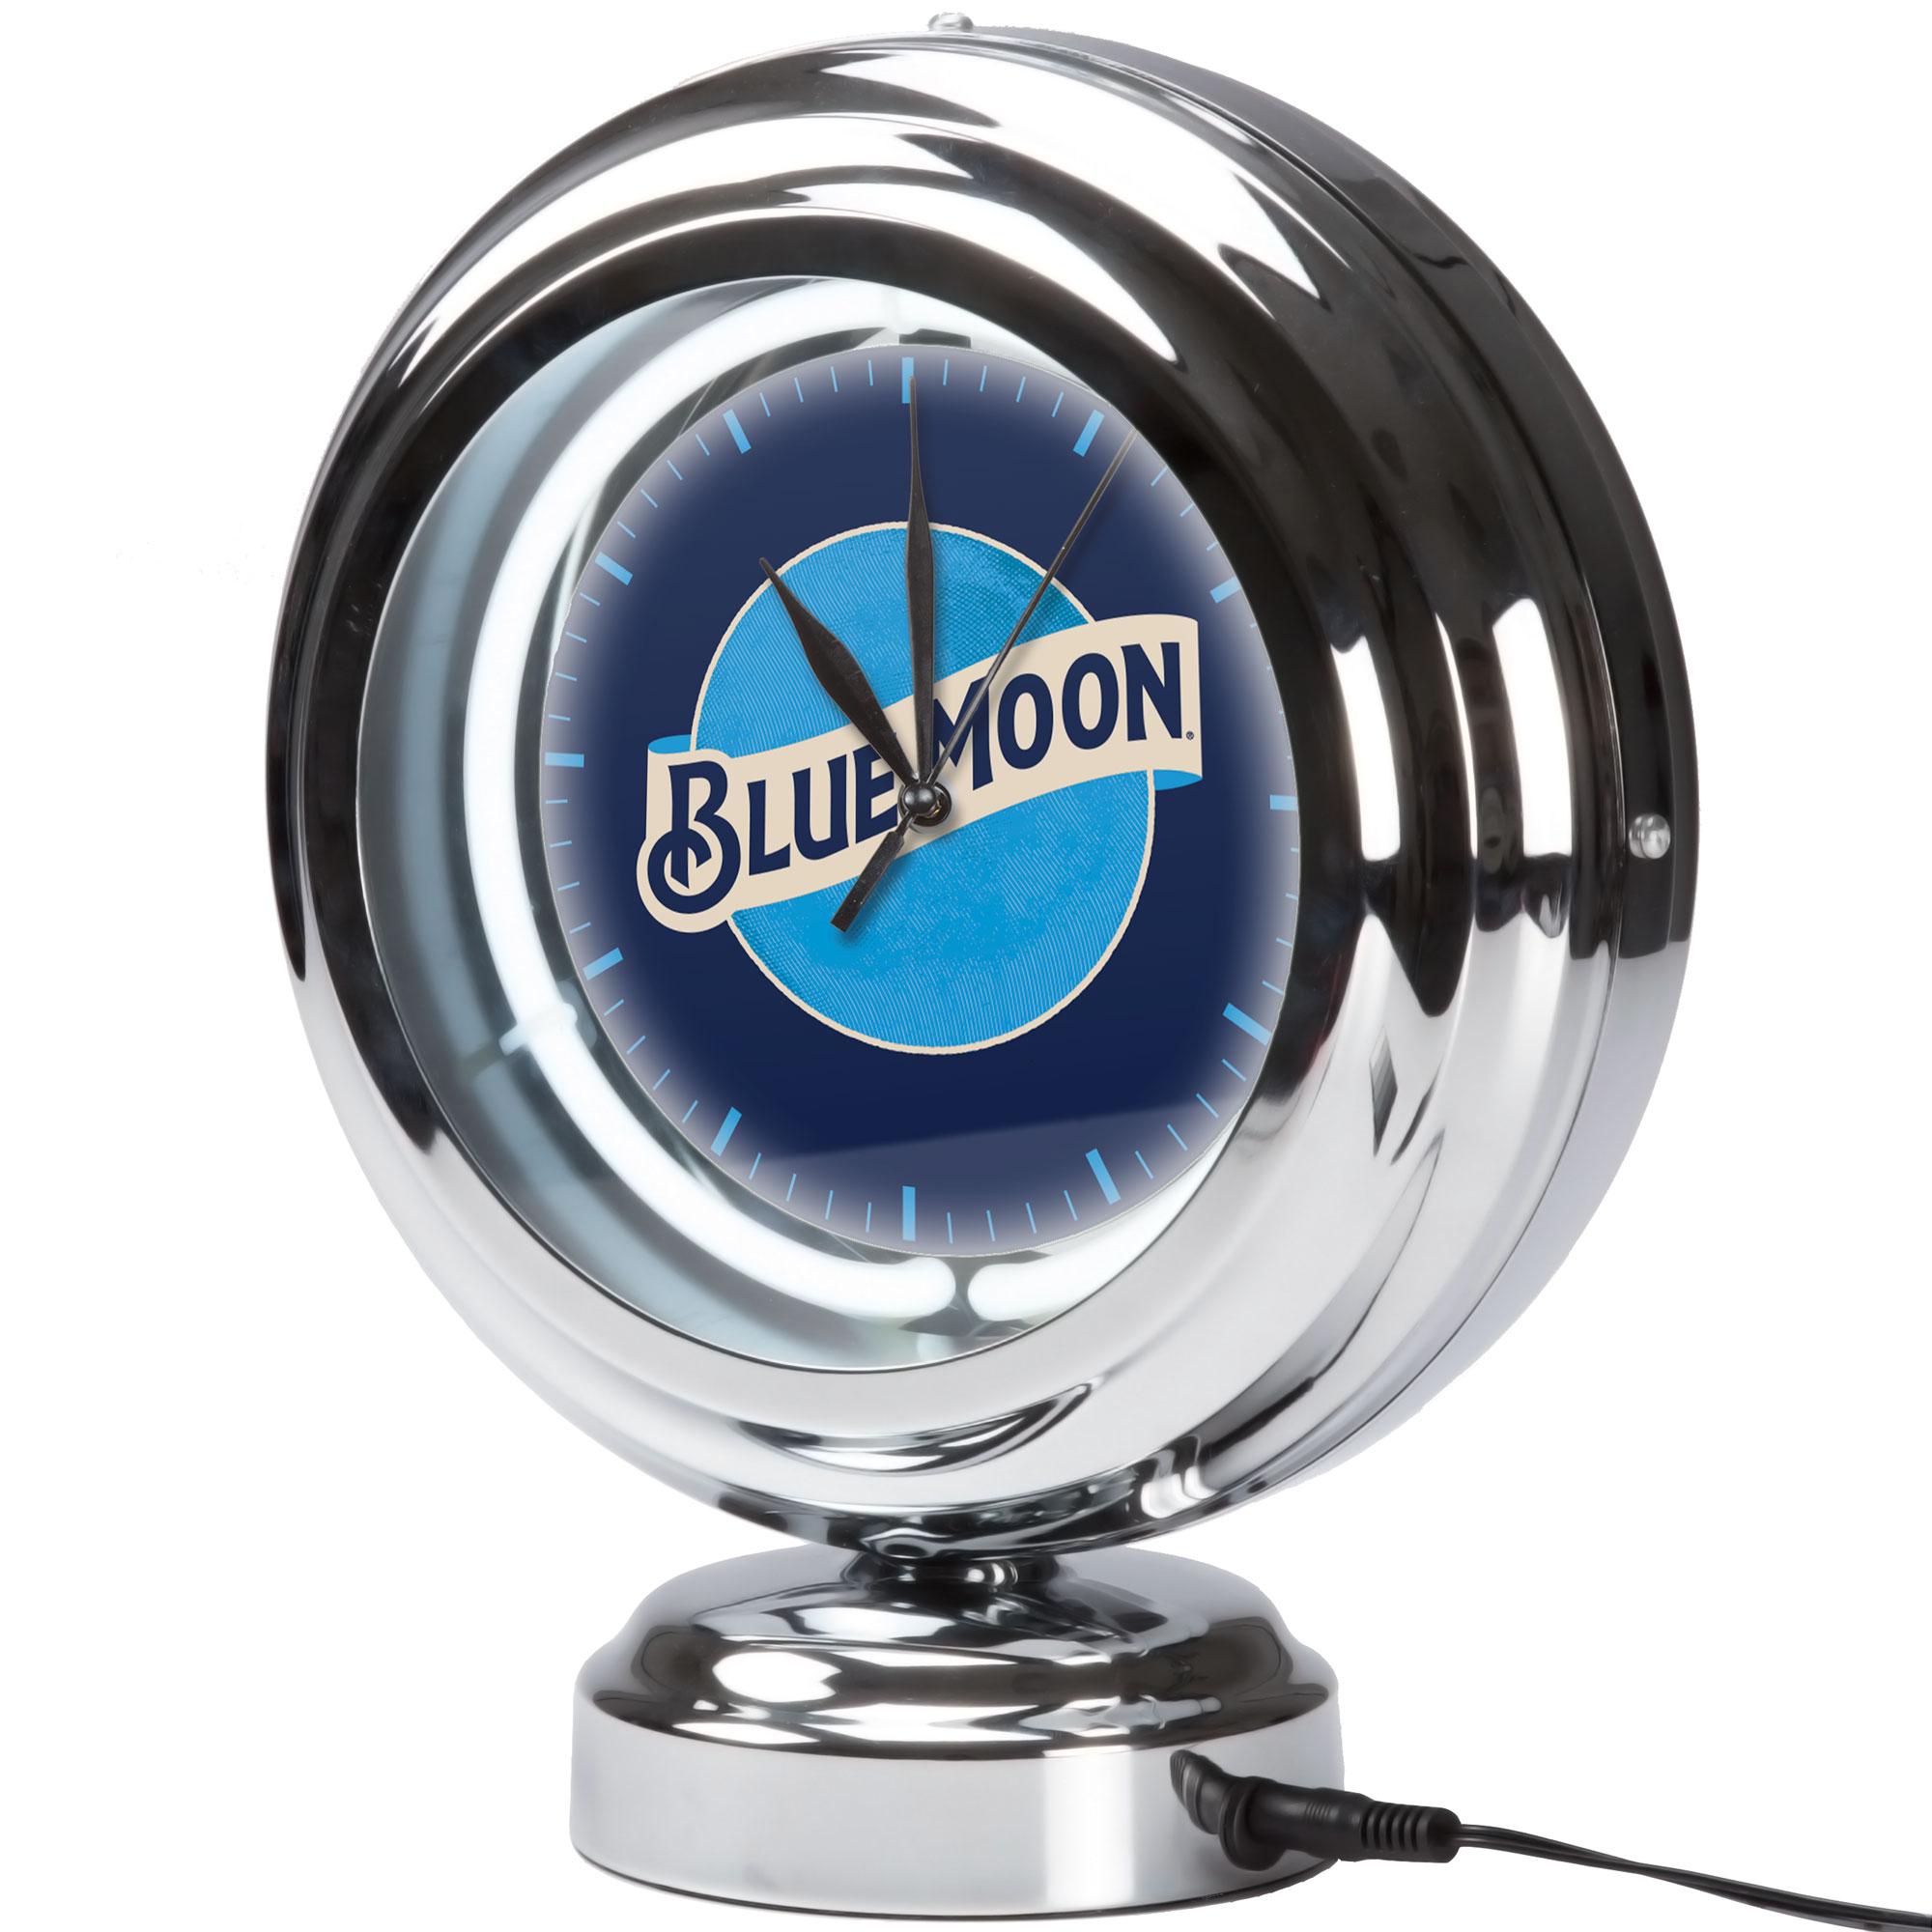 Image of Blue Moon Chrome Retro Style Tabletop Neon Clock